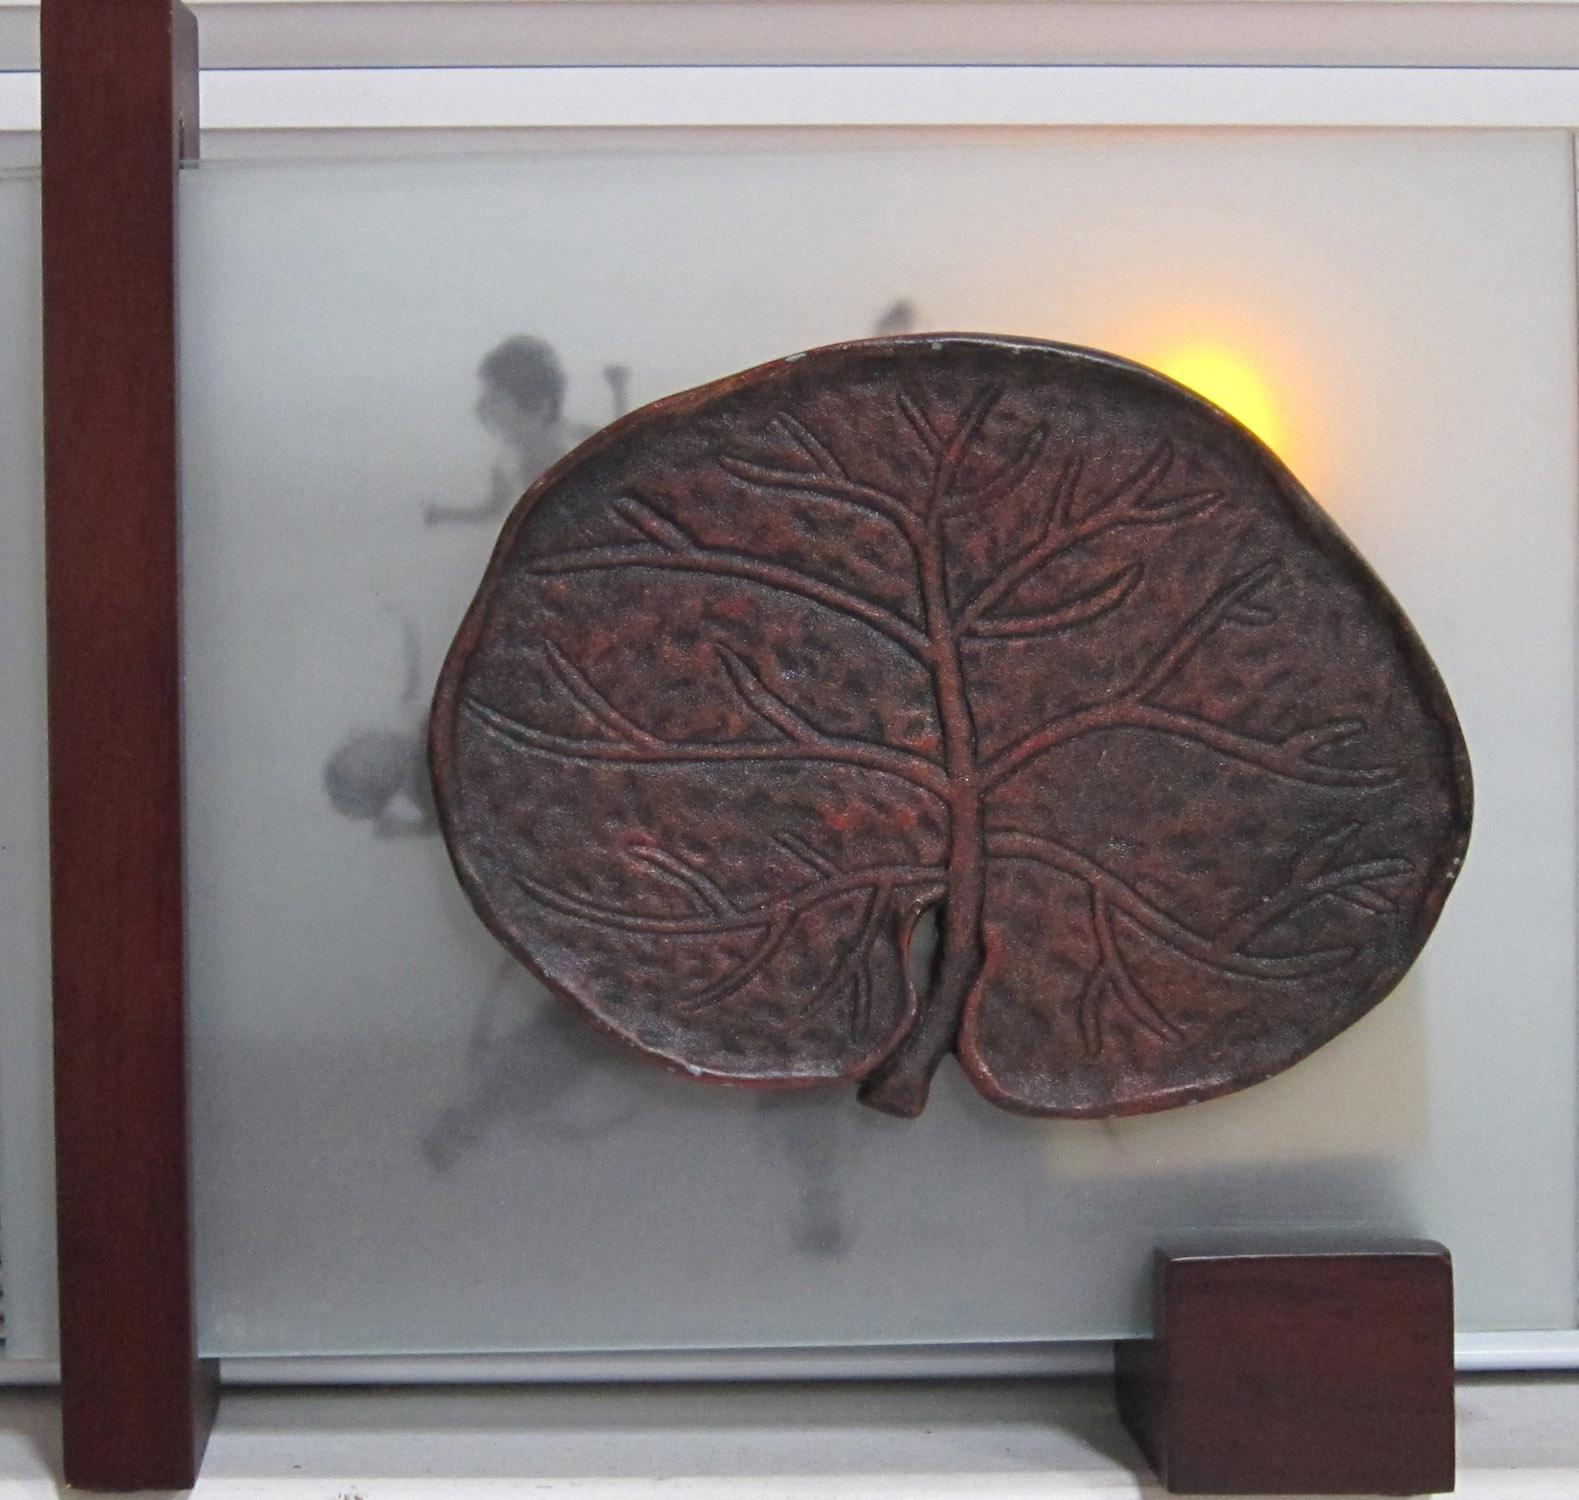 5cl(0) -Burning Bush- glass, clay, light, wood, 8x9x3 in., 2010.jpg